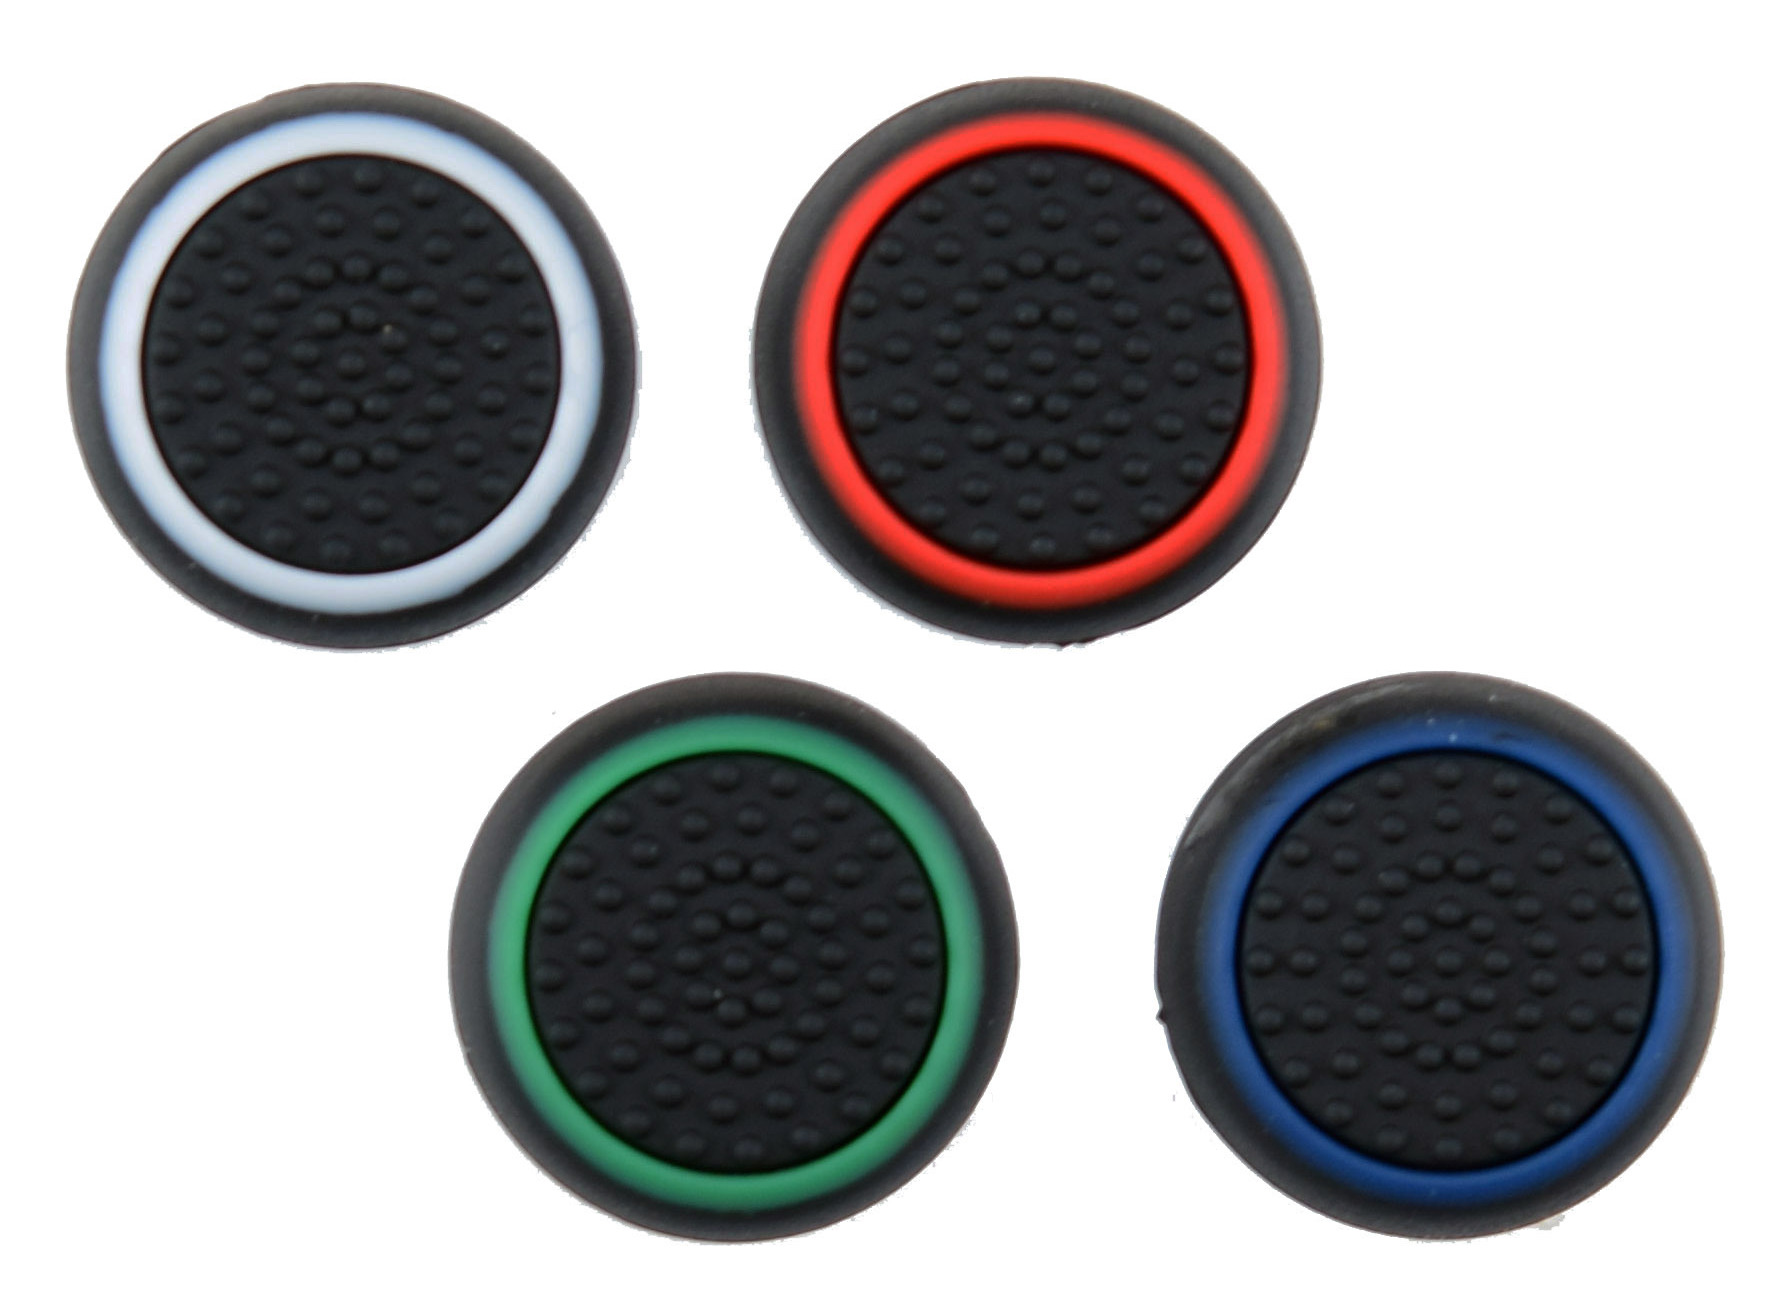 Item Lining, Gum, Pens, pad PlayStation 4 Xbox One